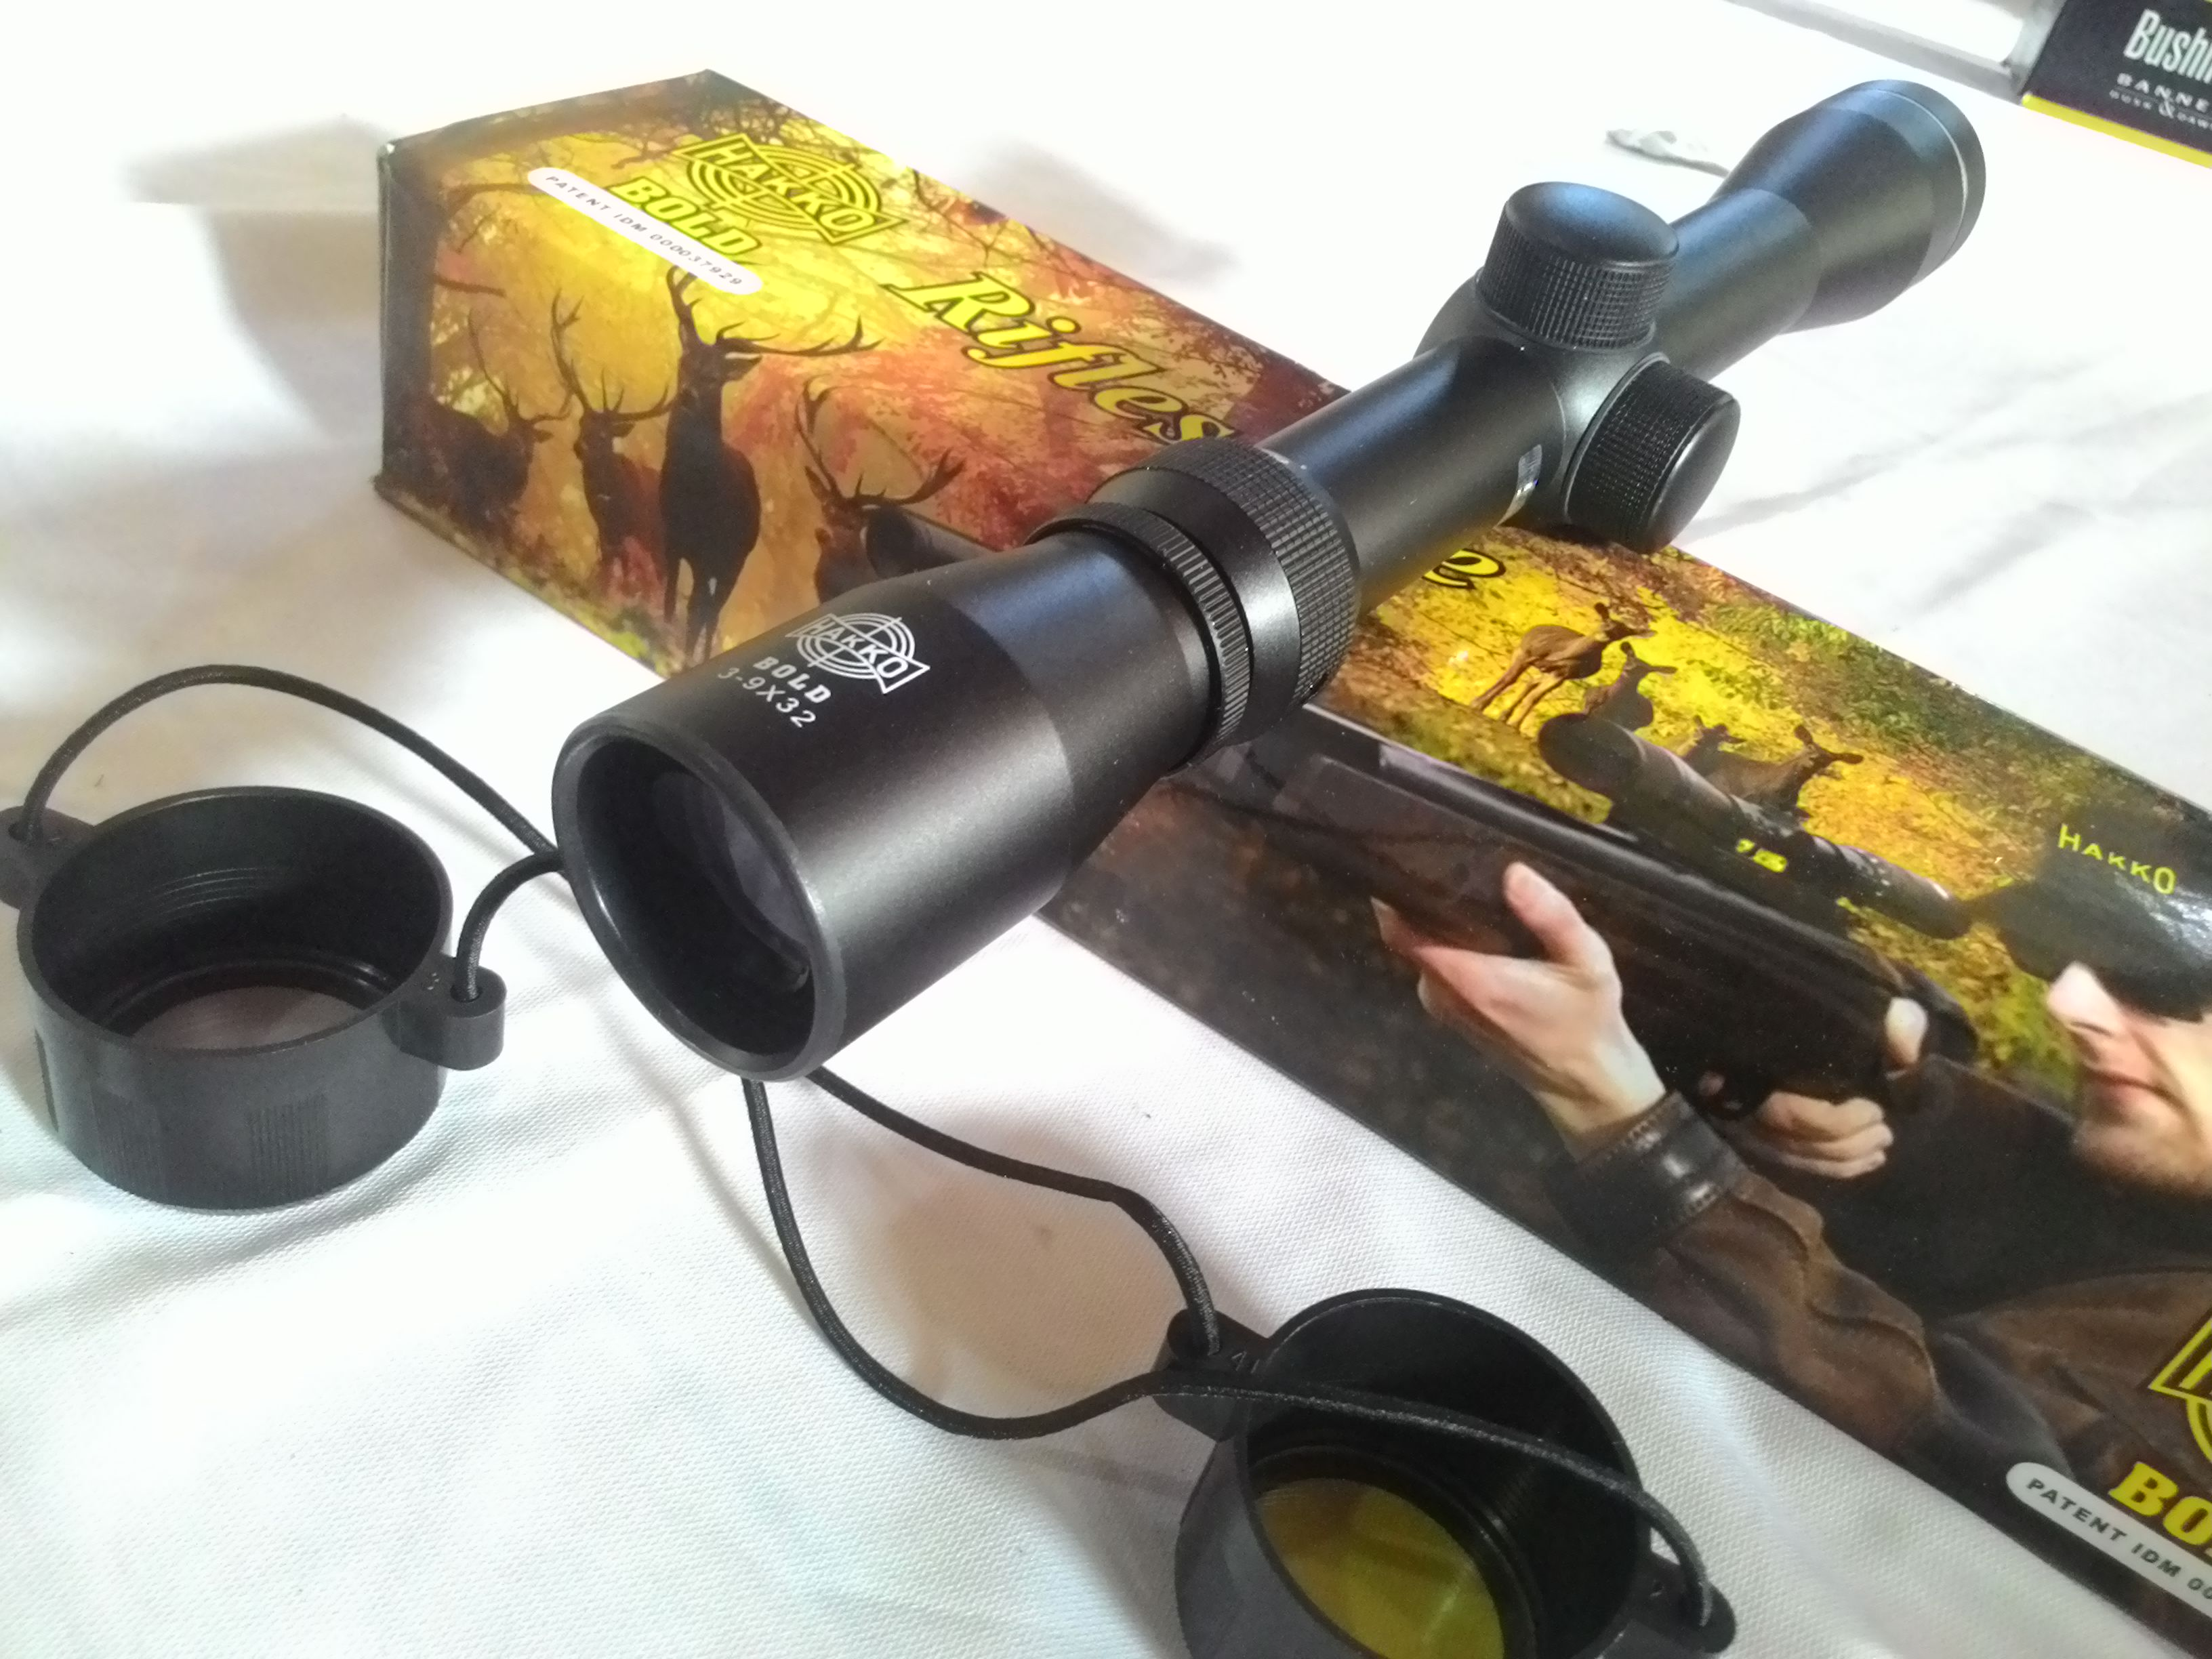 Teleskop senapan bekas dewi ger harga teleskop senapan angin